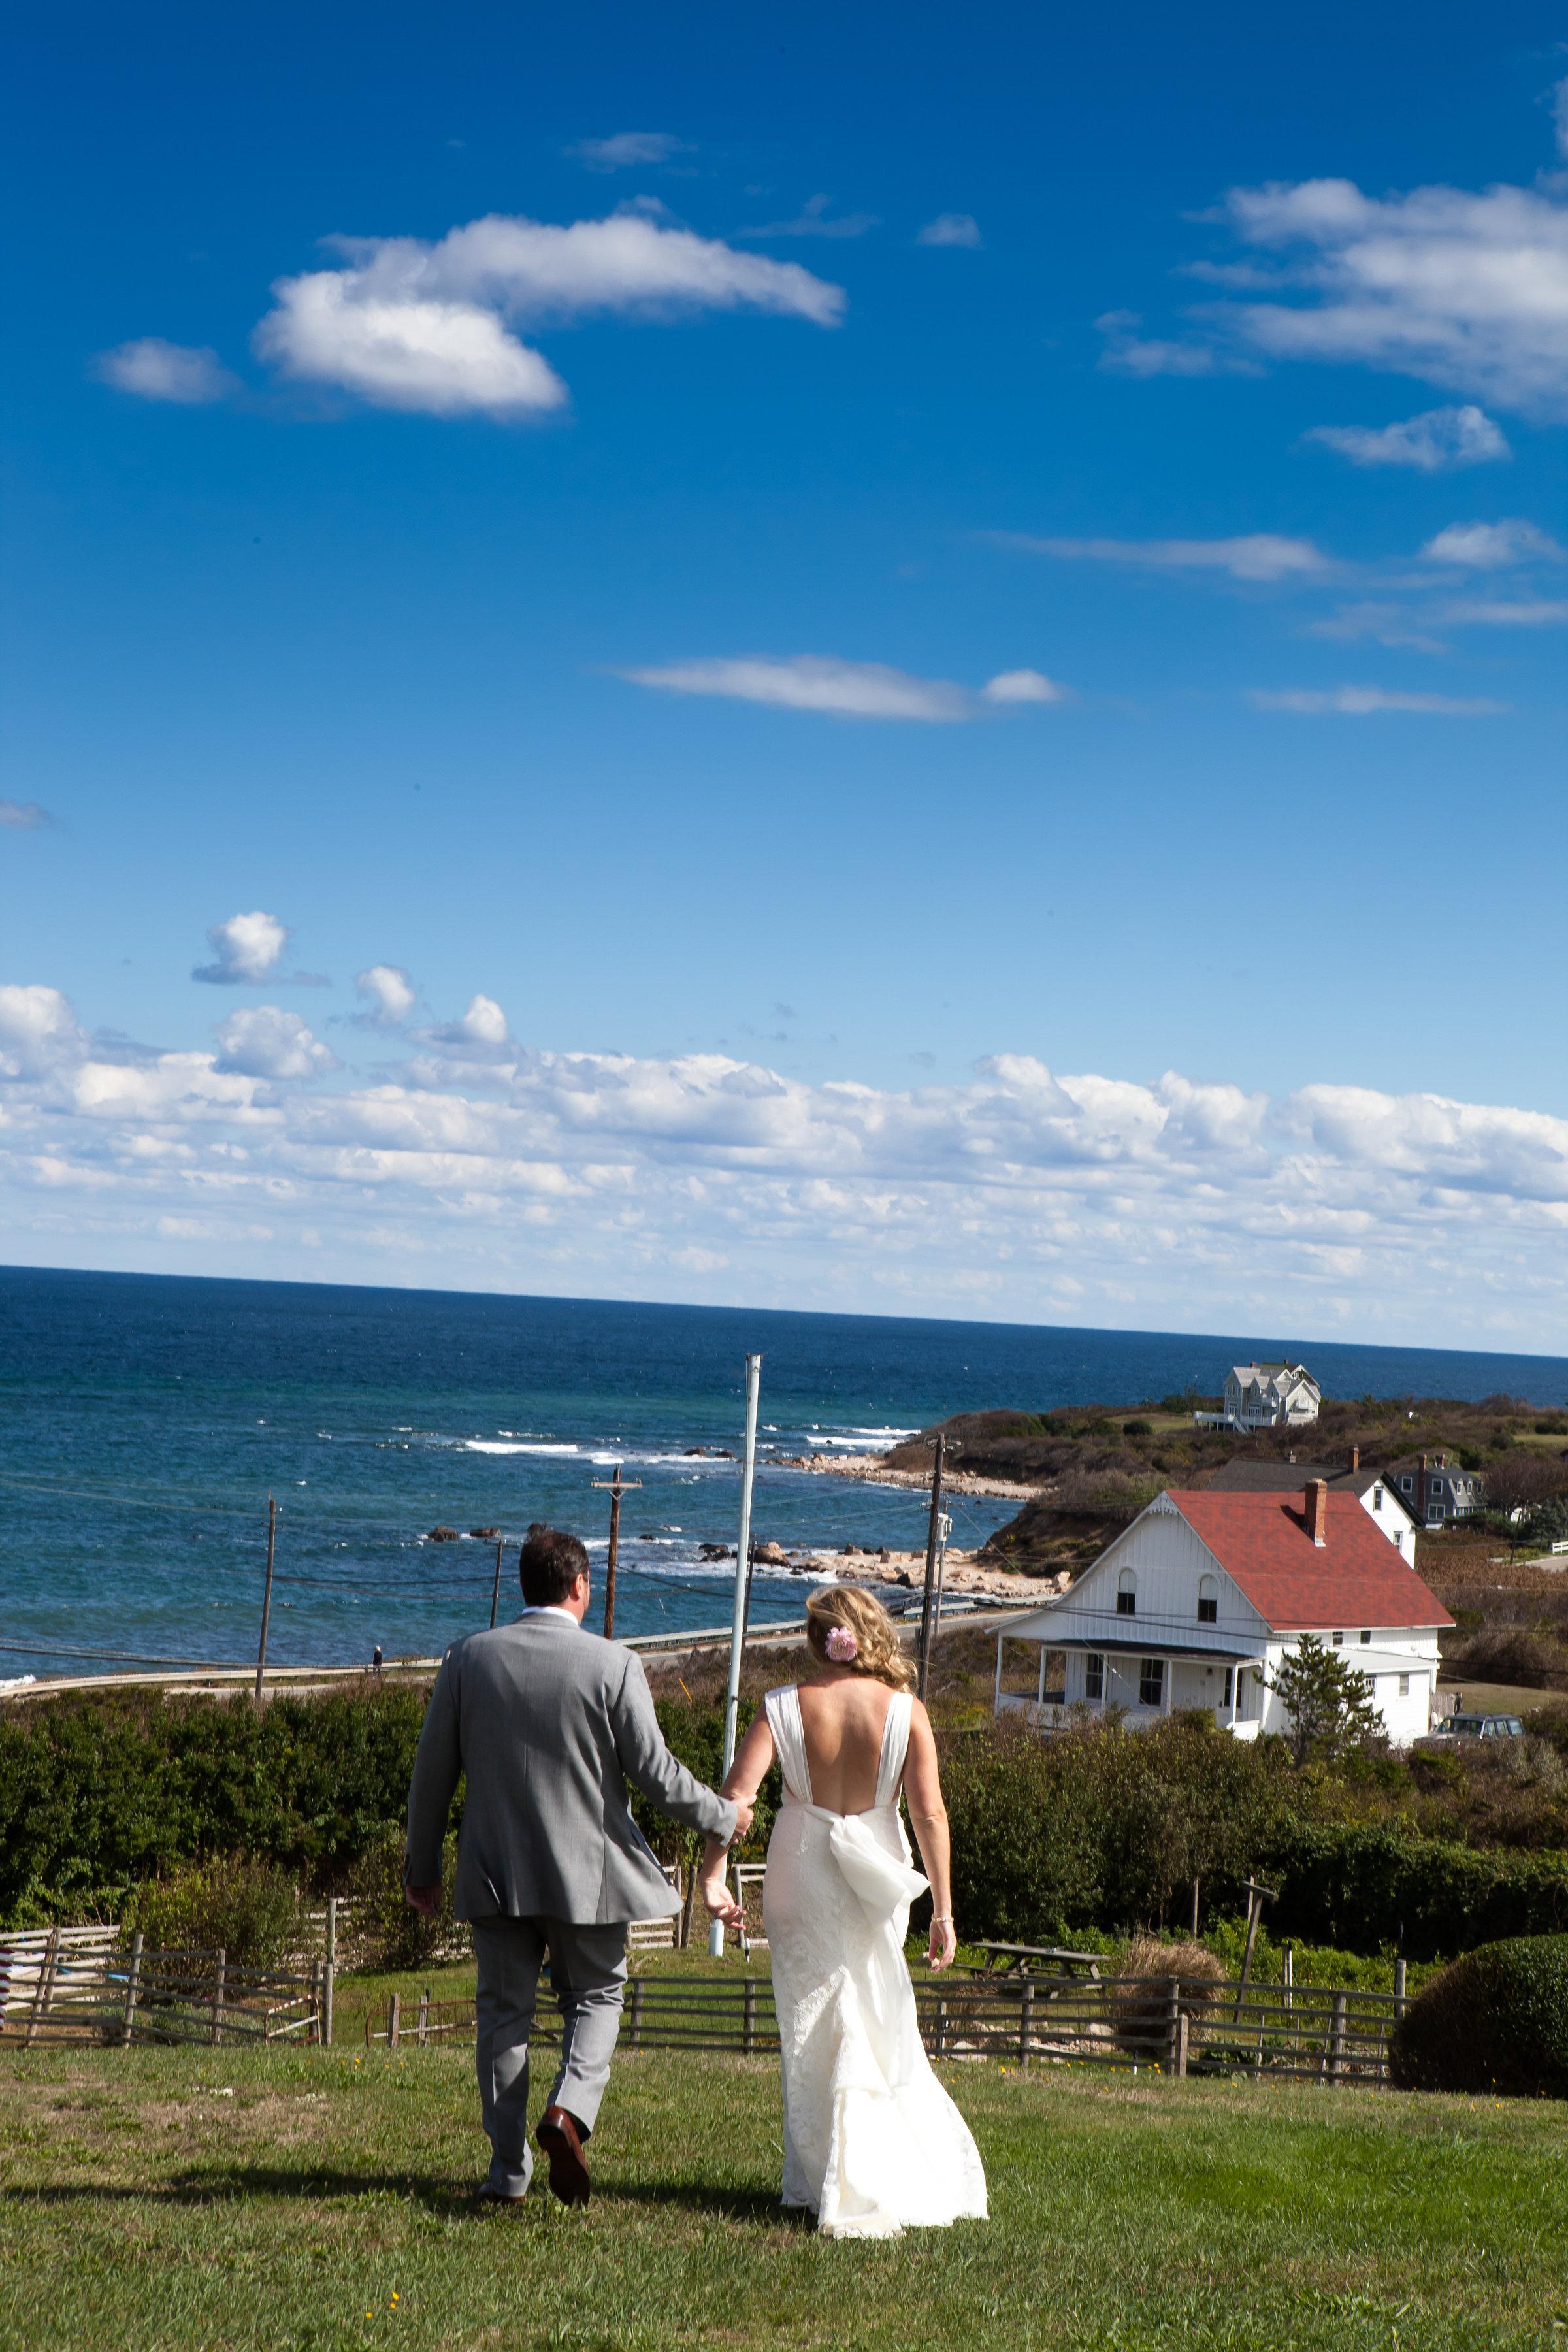 block-island-wedding-destination-wedding-0032.jpg